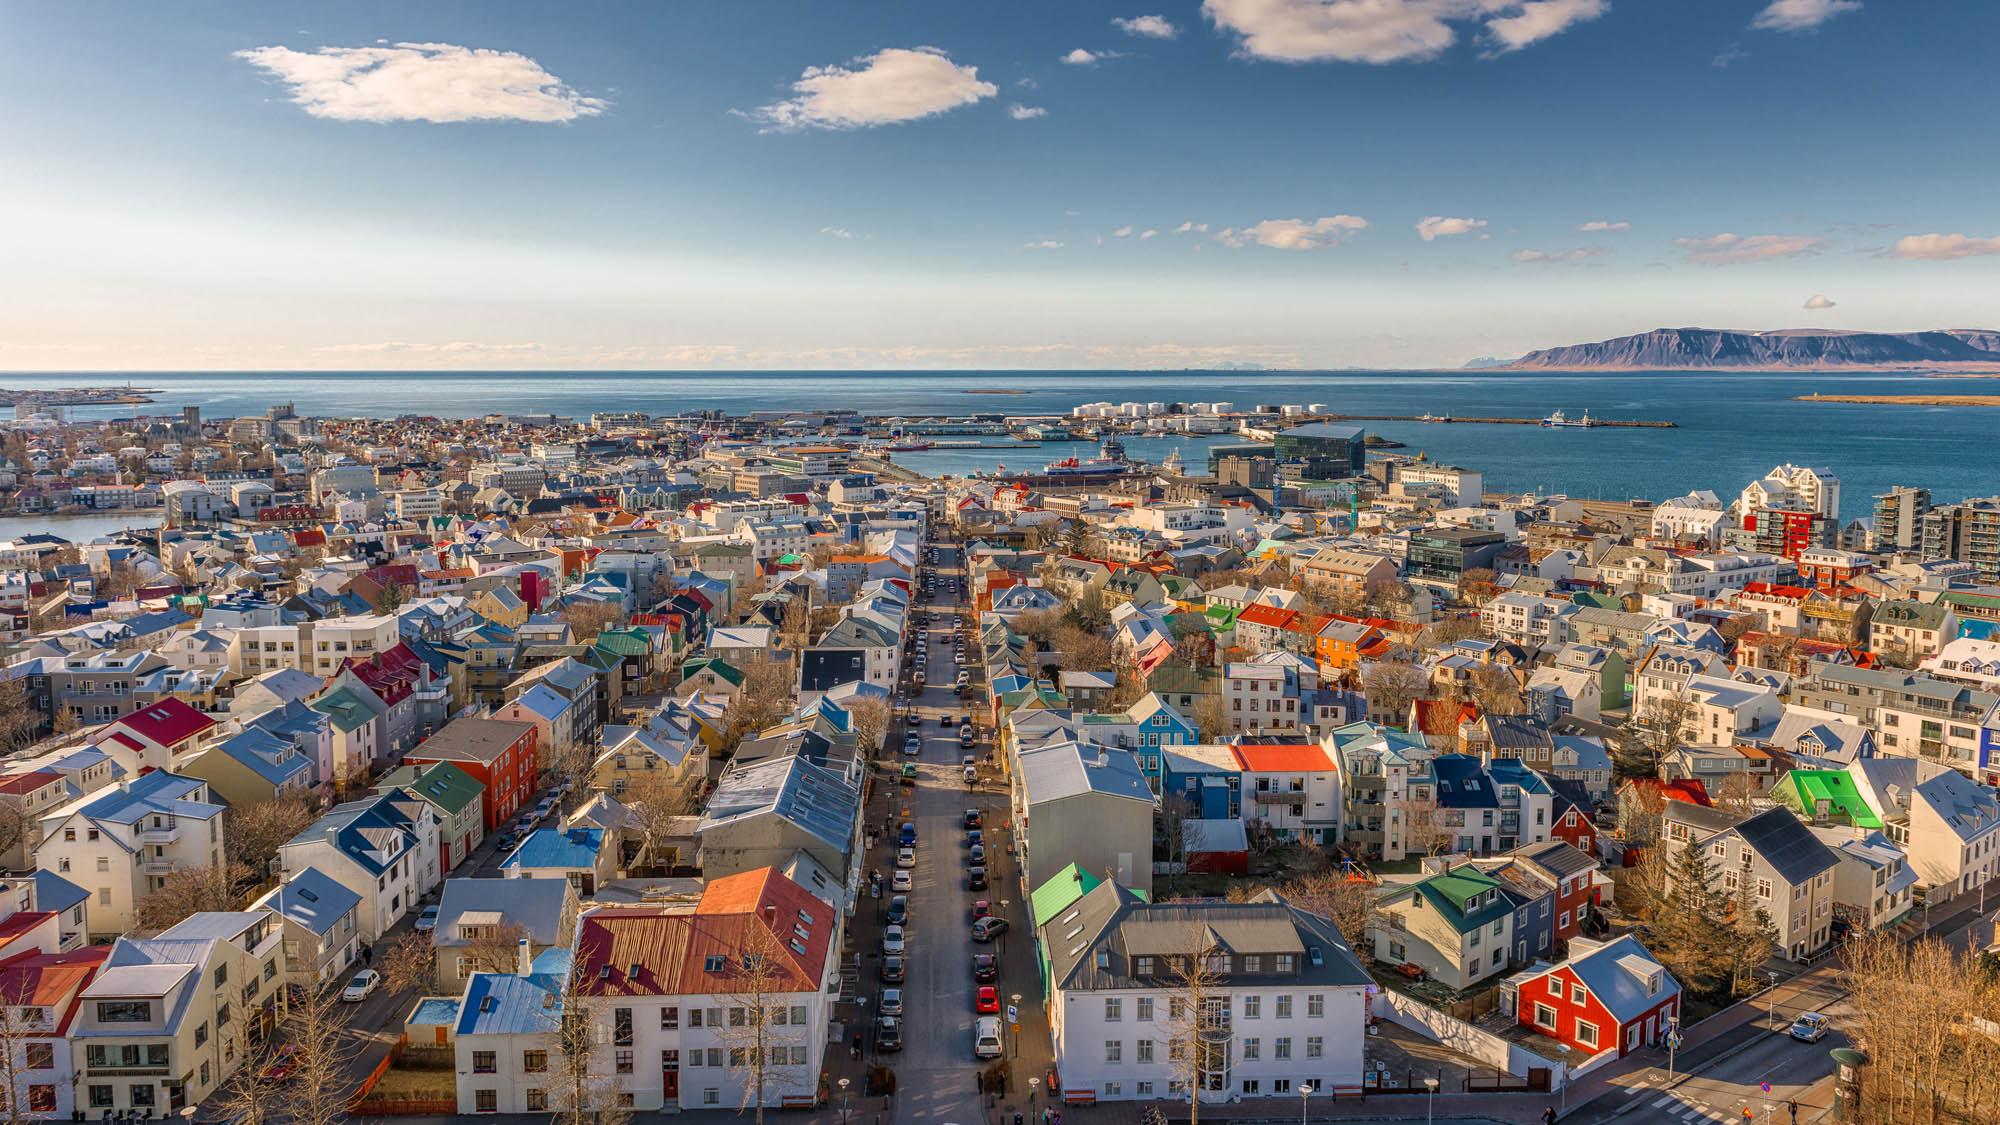 Reykjavik Iceland Summer Top View